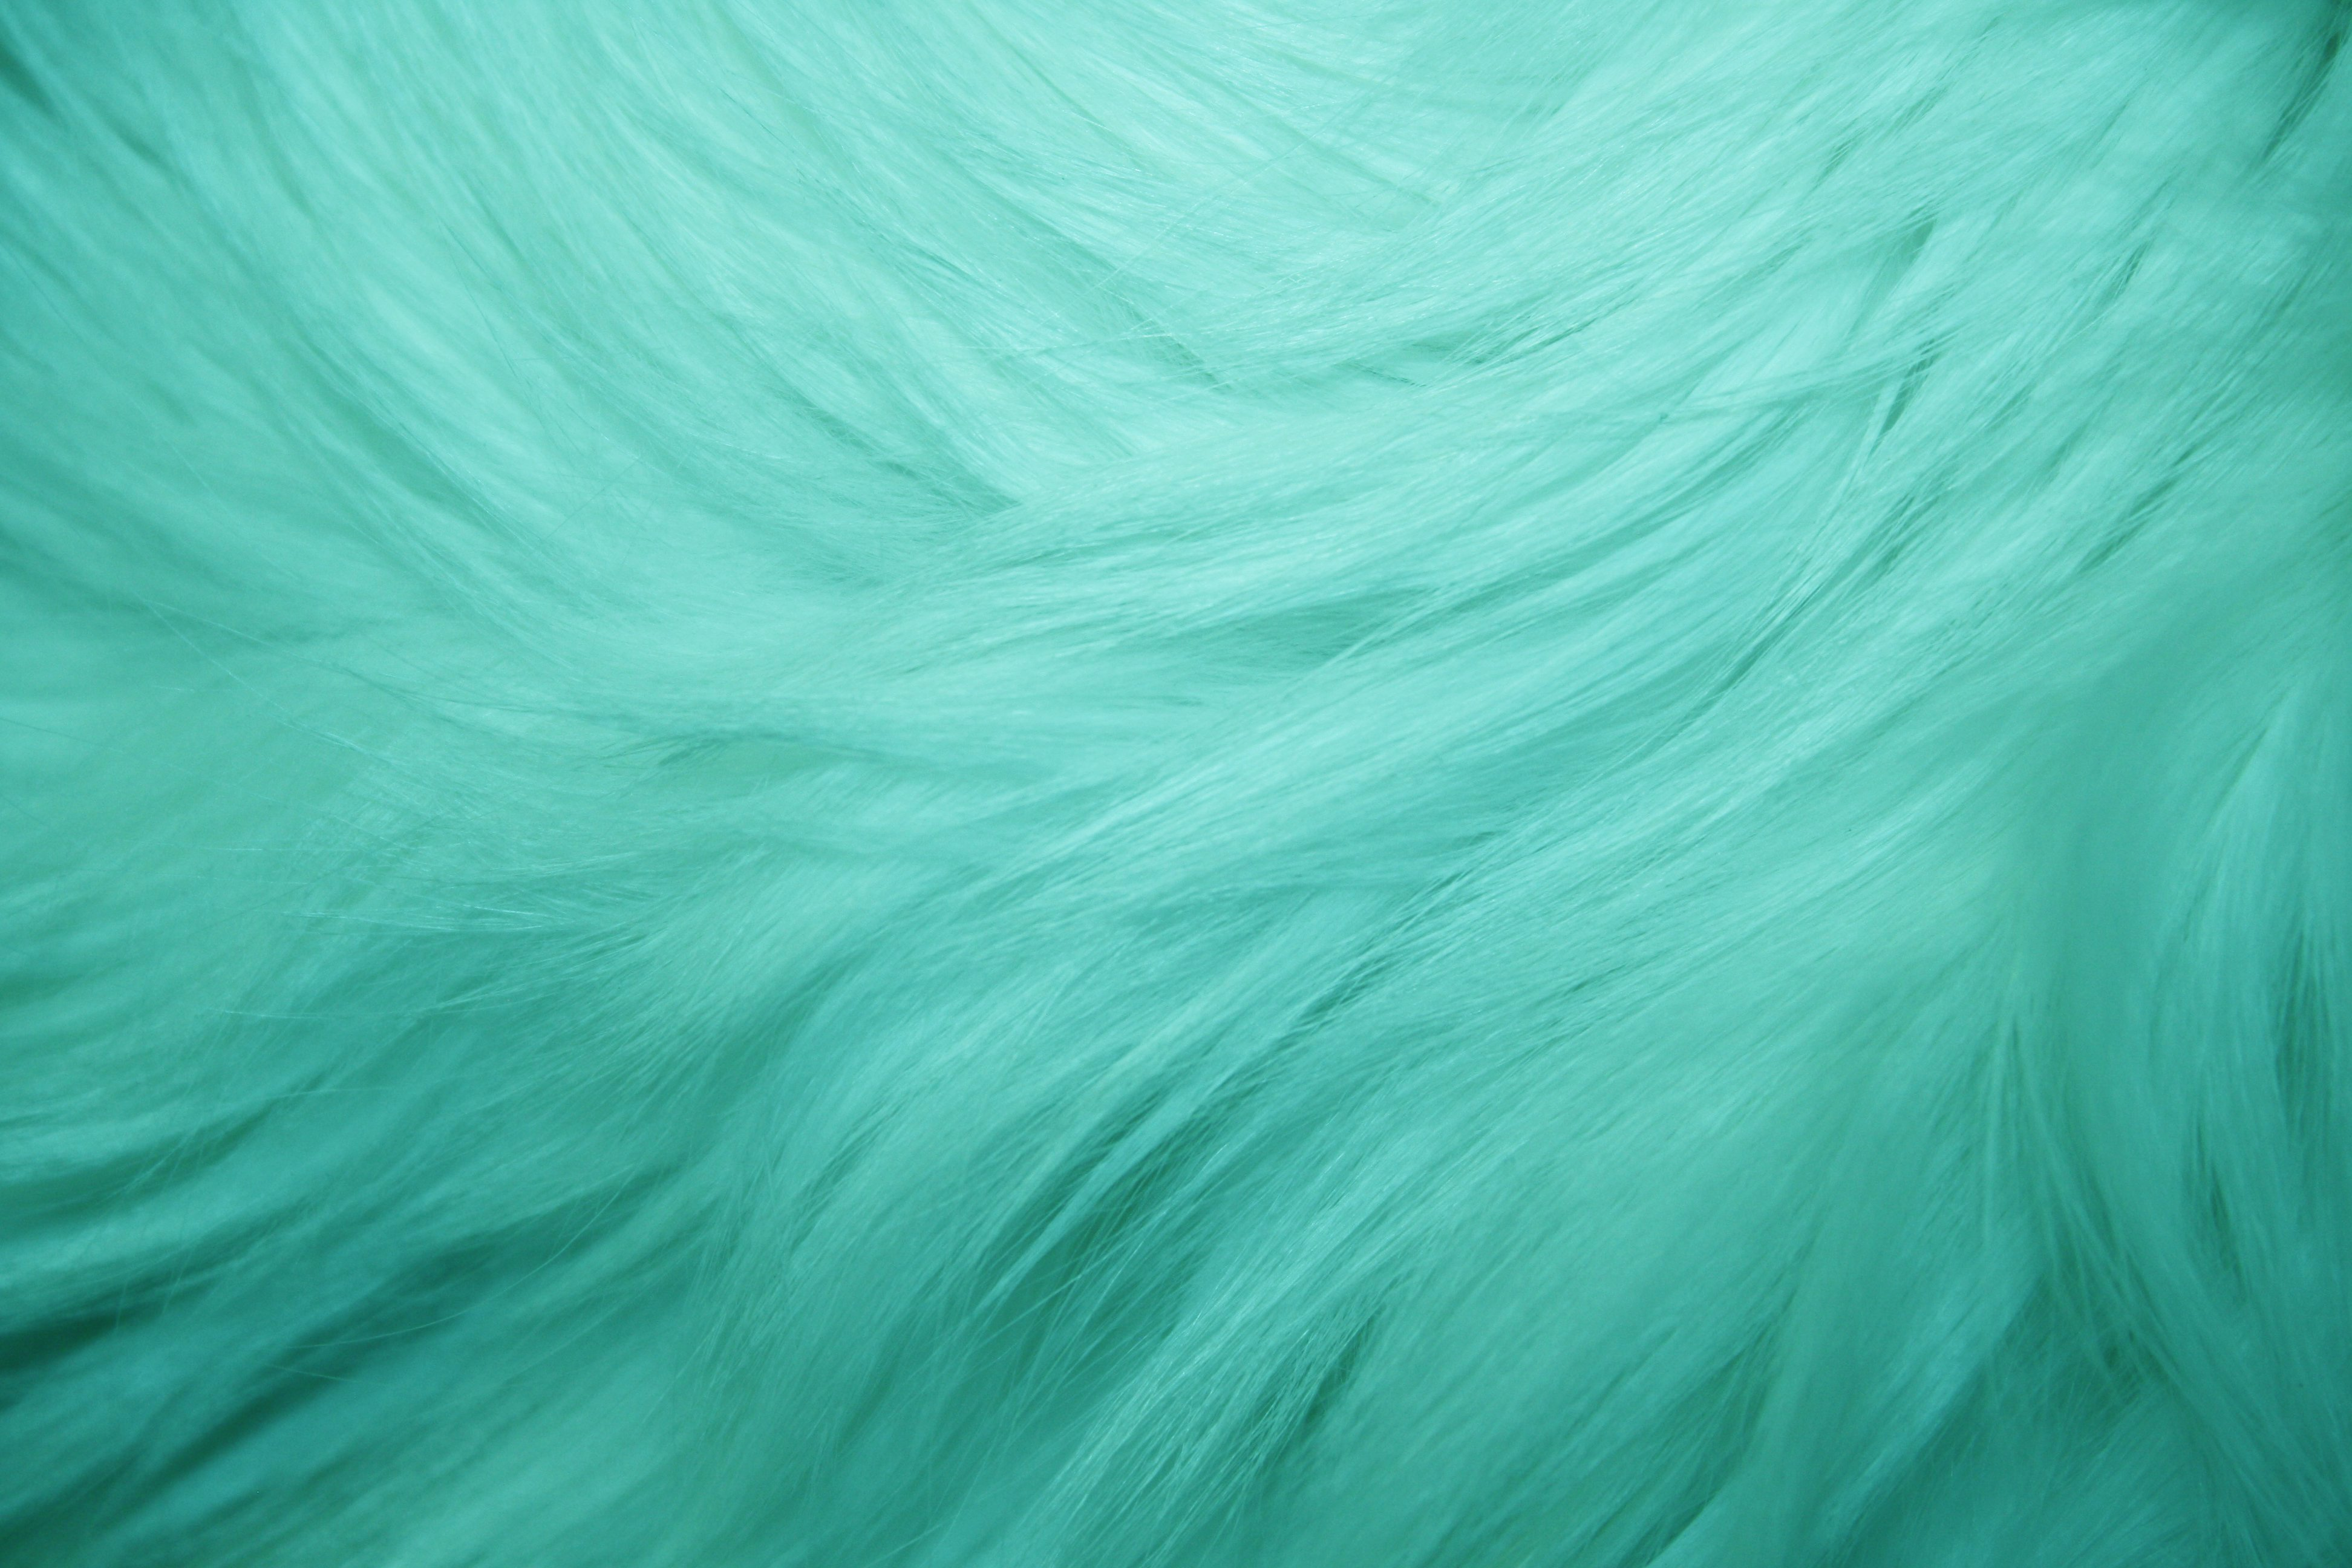 Teal Fur Texture   High Resolution Photo   Dimensions 3888 3888x2592